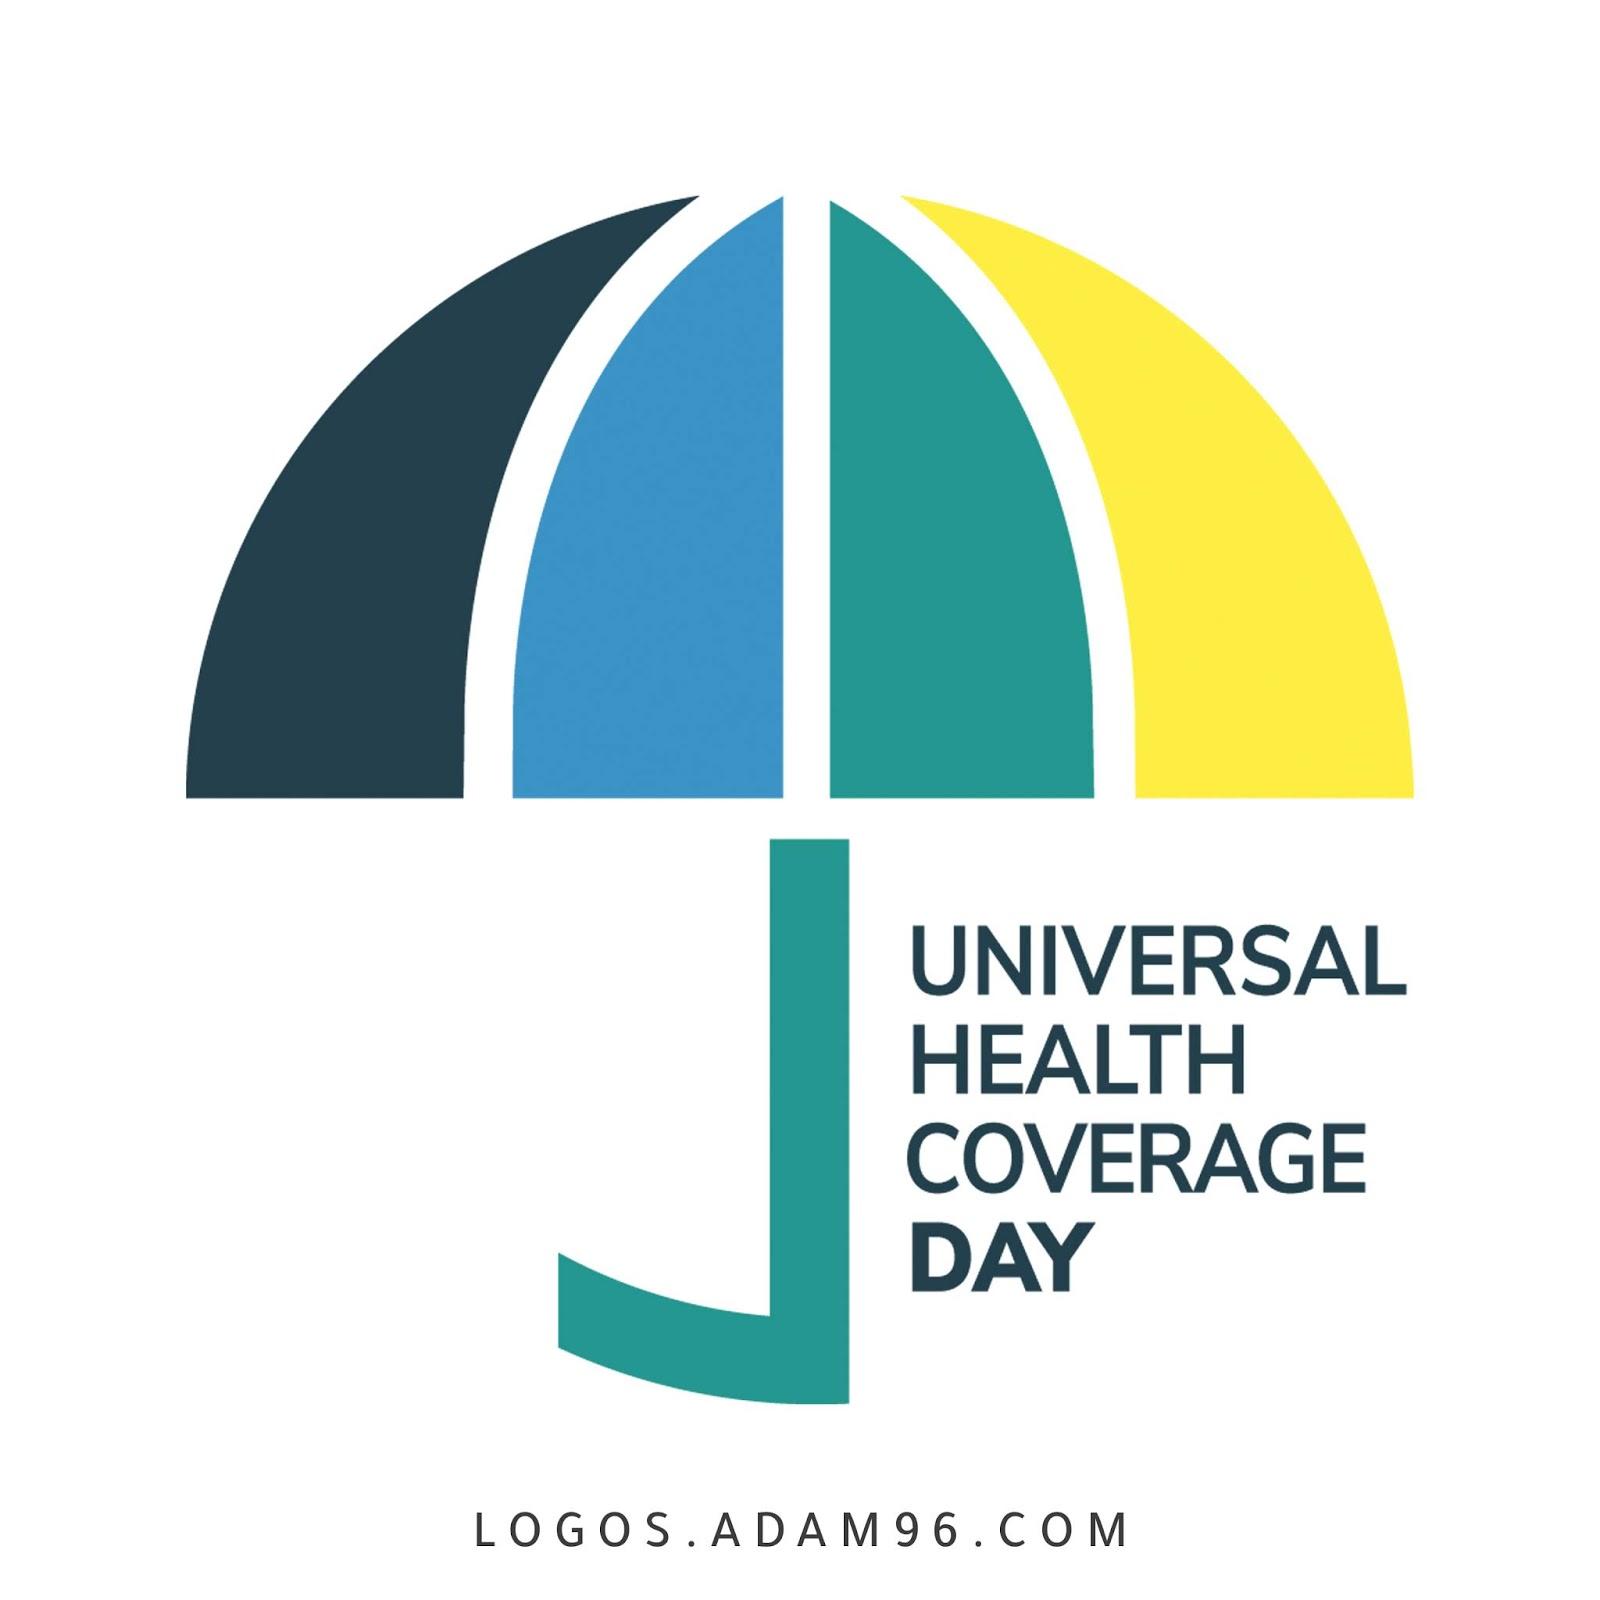 UHC Day